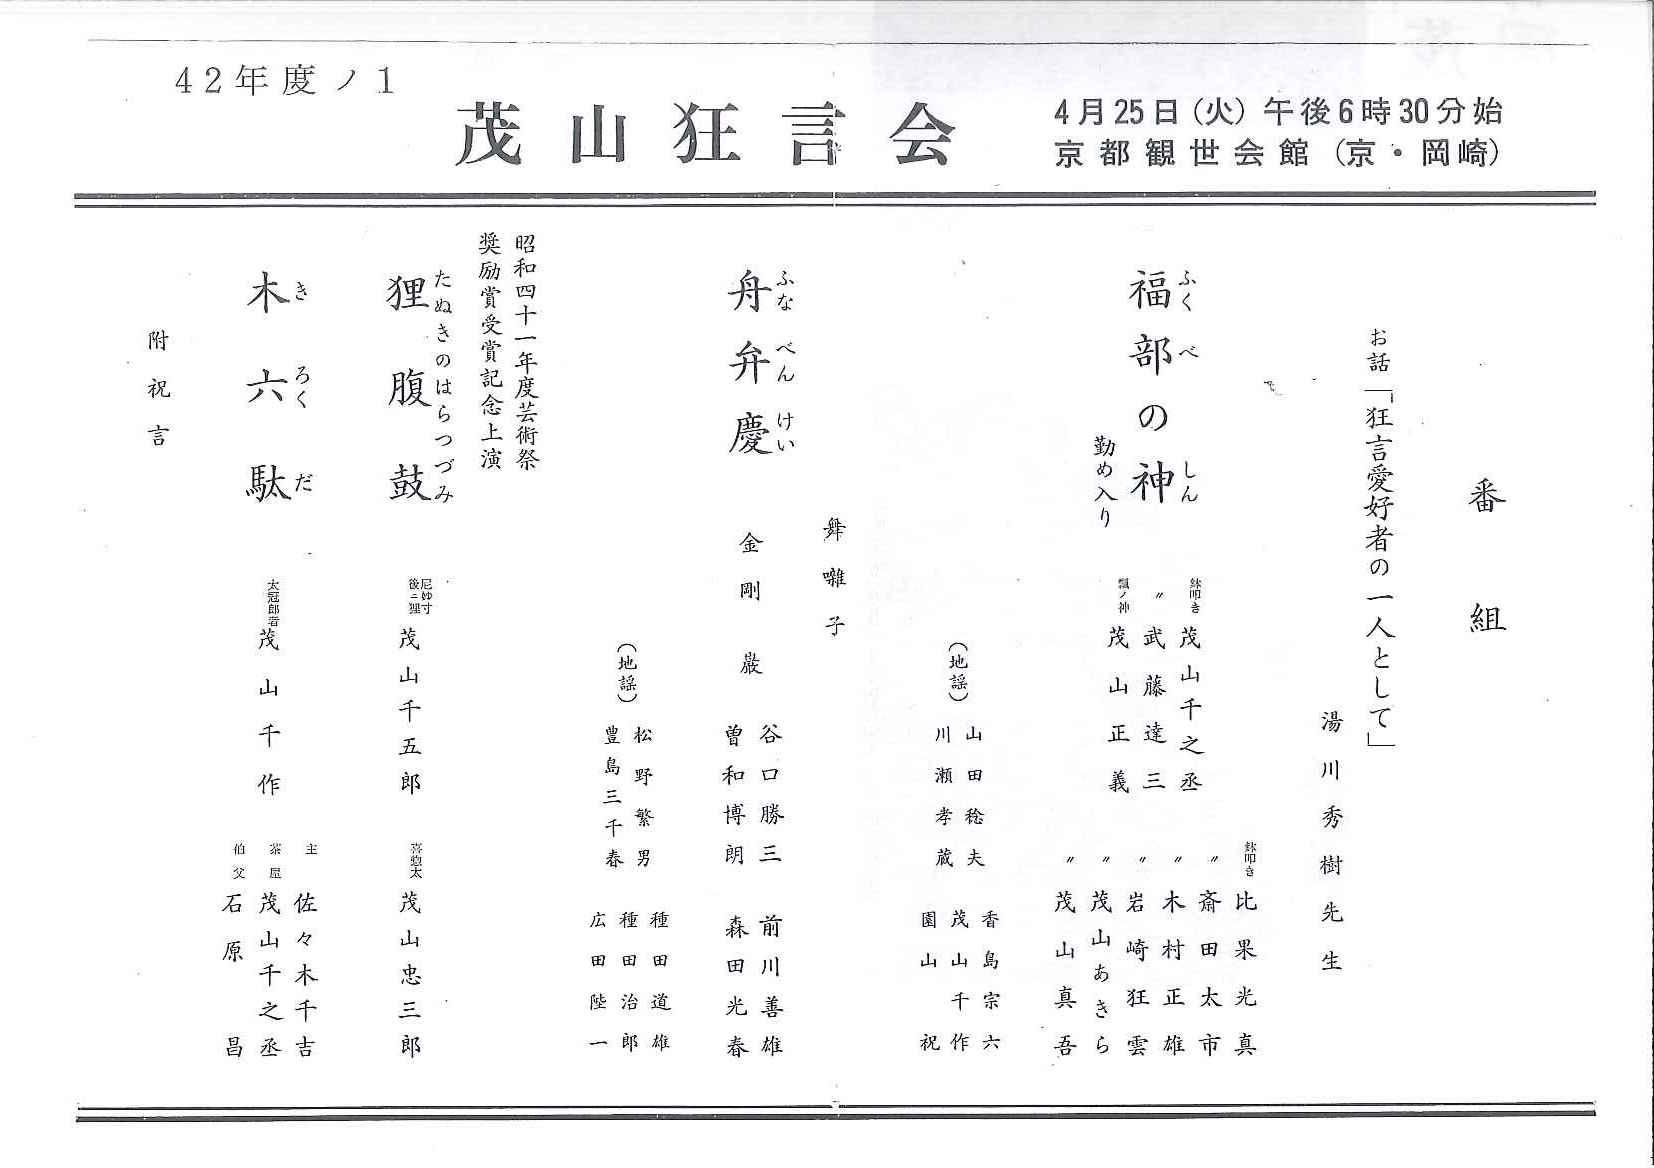 S42shigekyo1